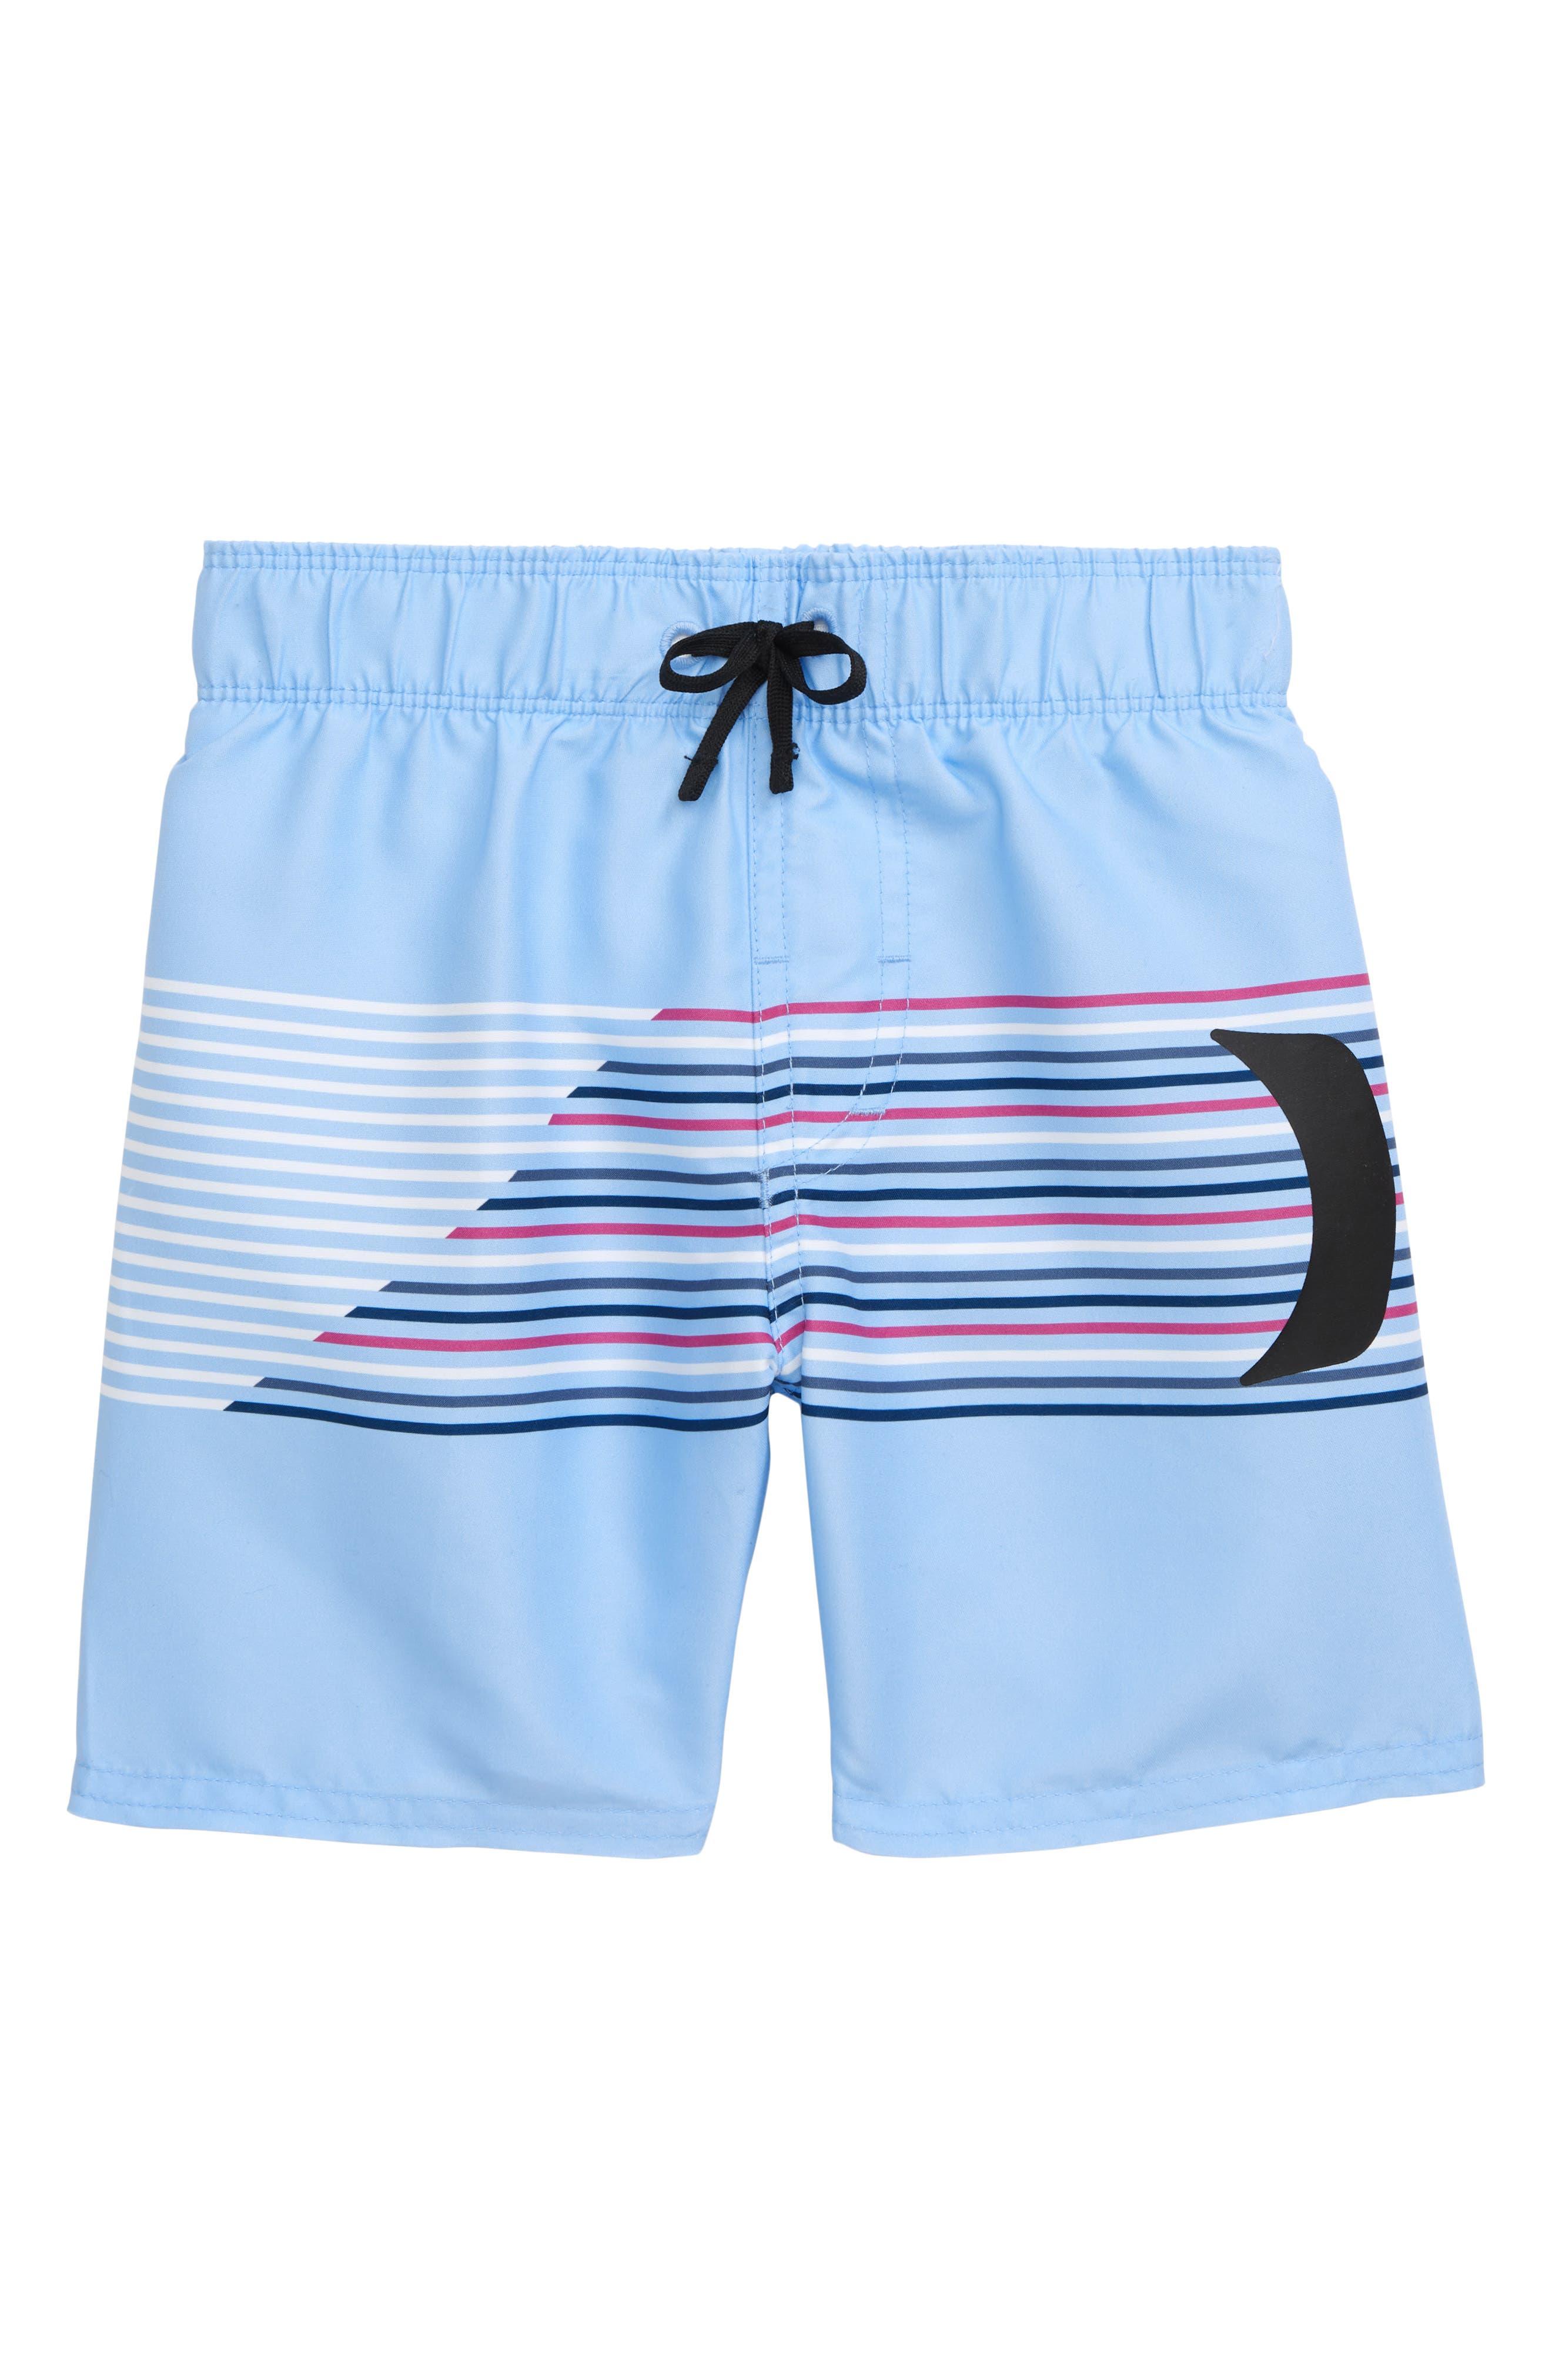 Image of Hurley Slash Swim Trunks